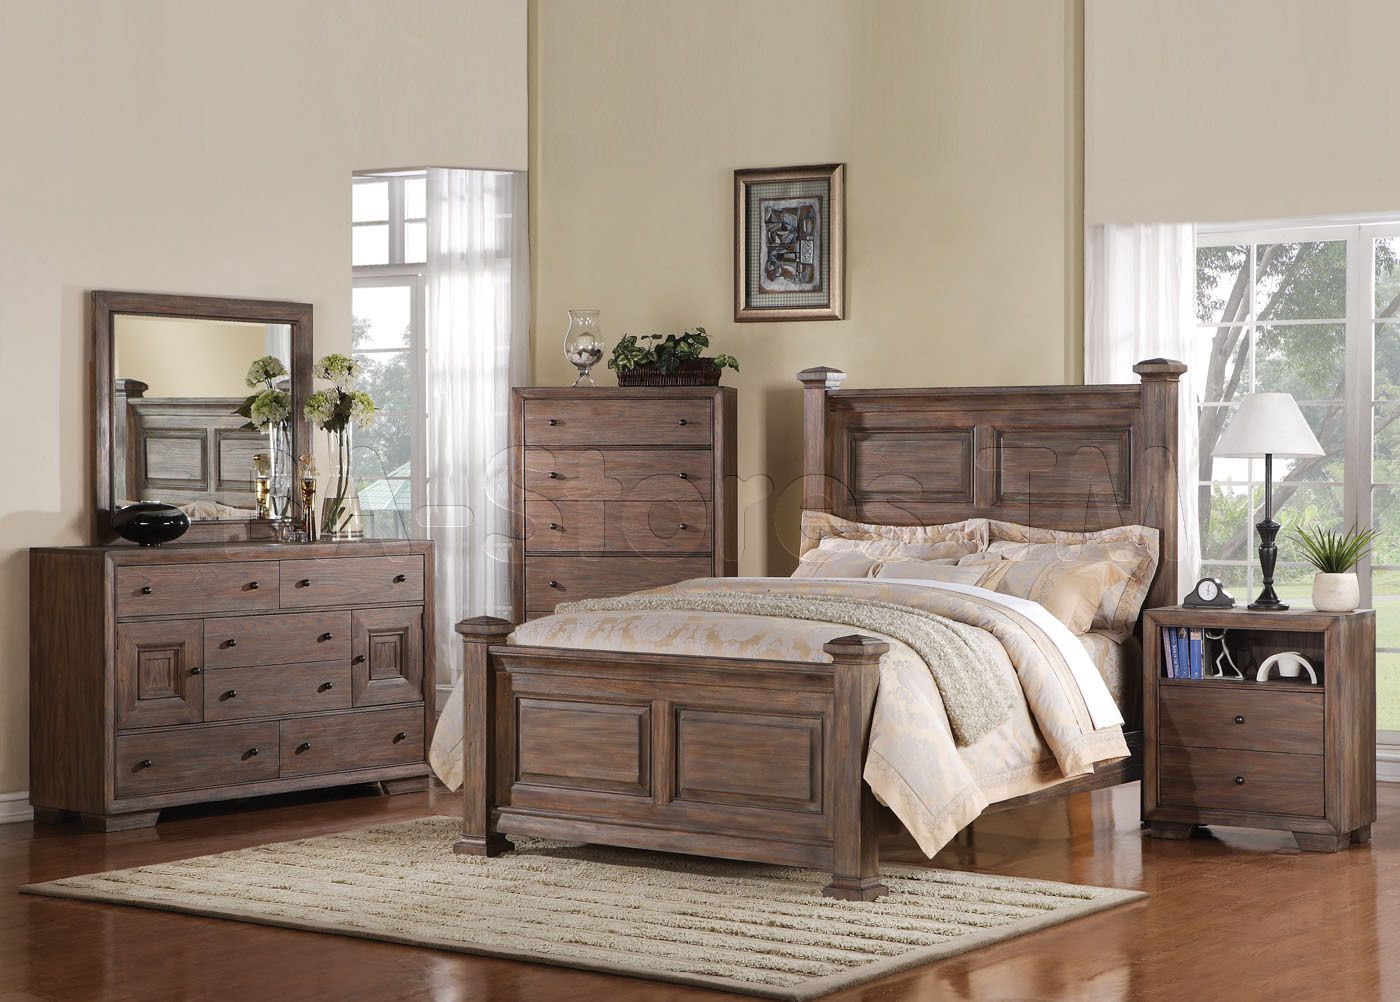 Distressed Wood Bedroom Furniture Httpcoastersfurniture New Wood Bedroom Sets Decorating Inspiration